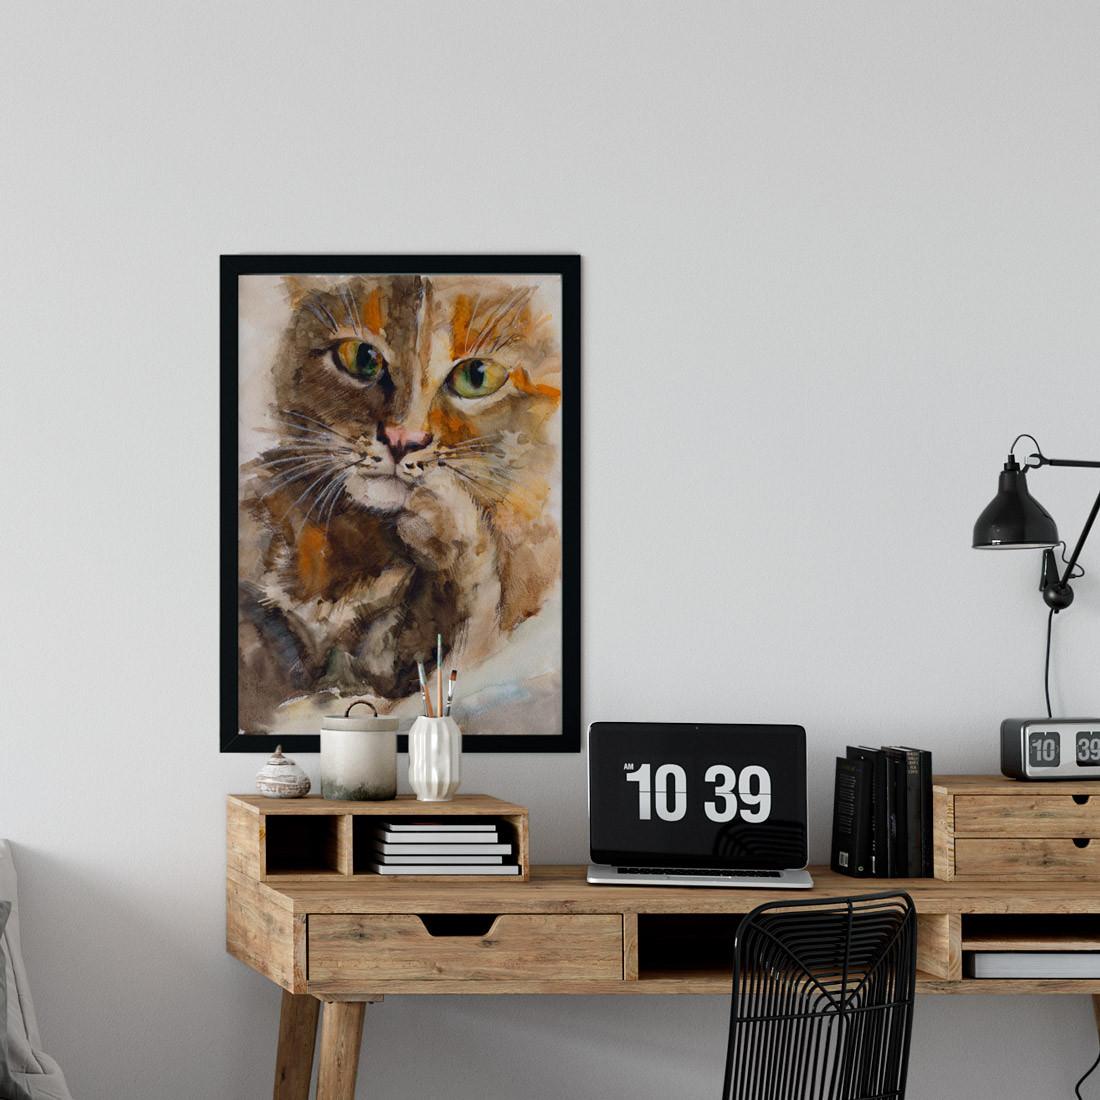 Quadro Decorativo Gato Pintado